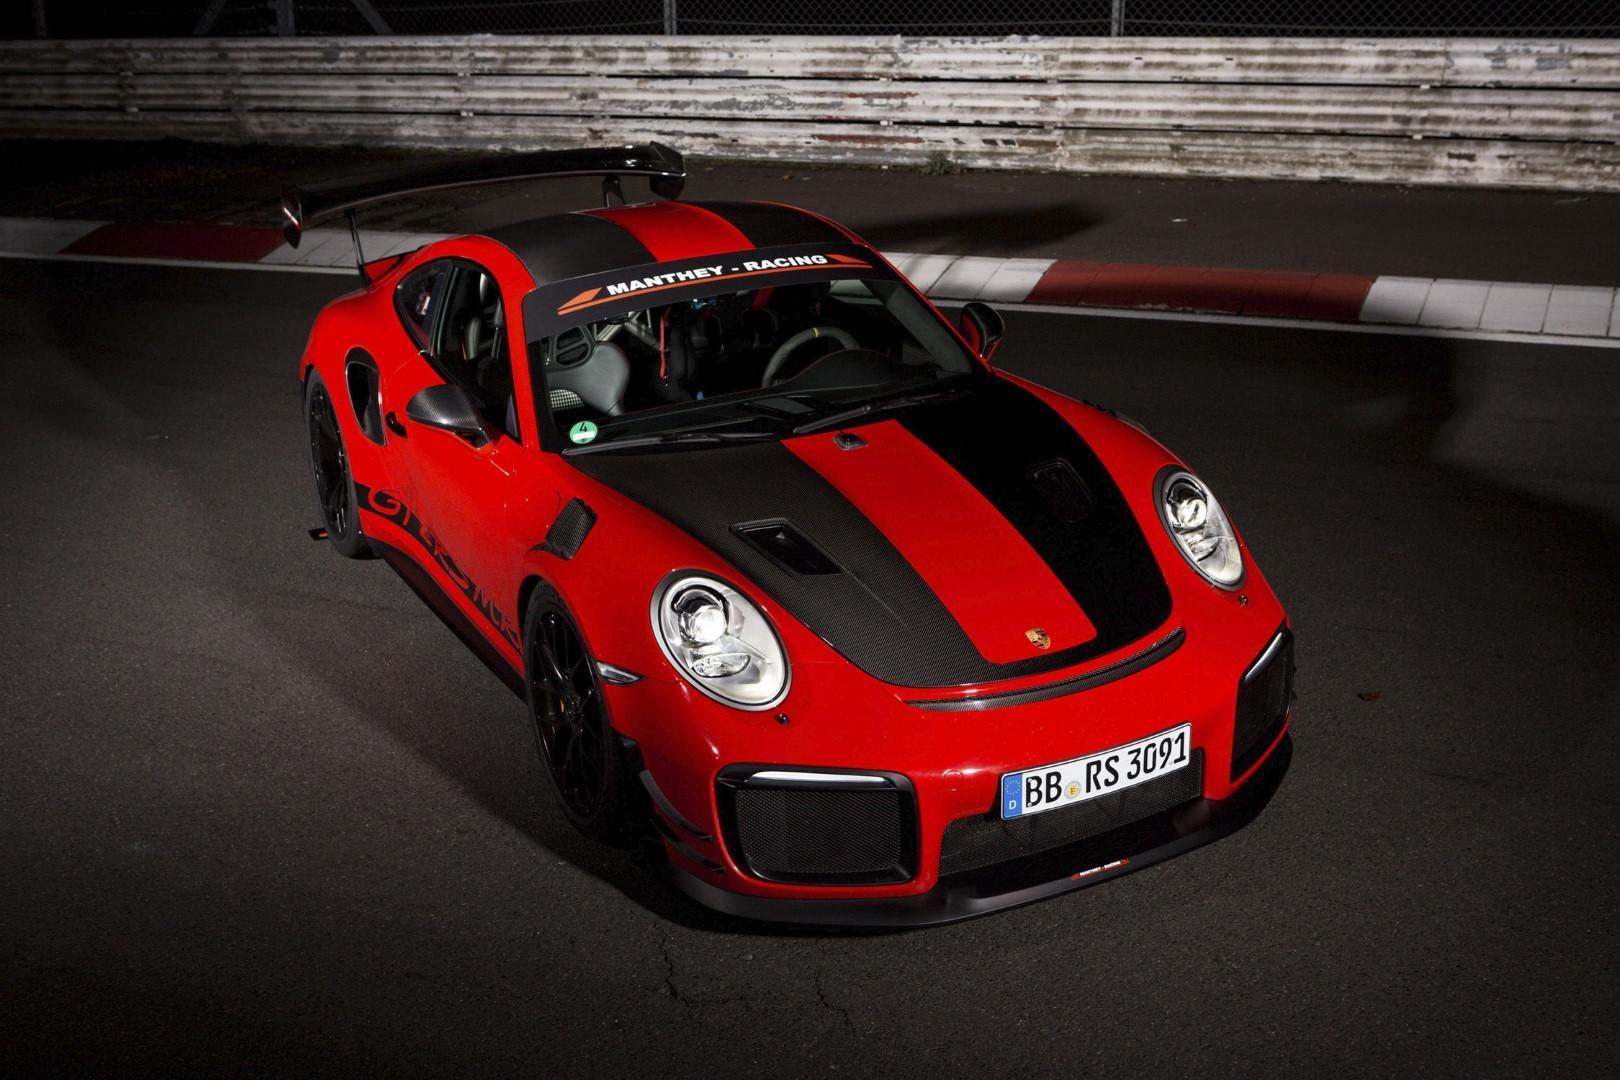 video-porsche-911-gt2-rs-mr-la-nouvelle-reine-du-ring-du-nuerburgring-907-2.jpg